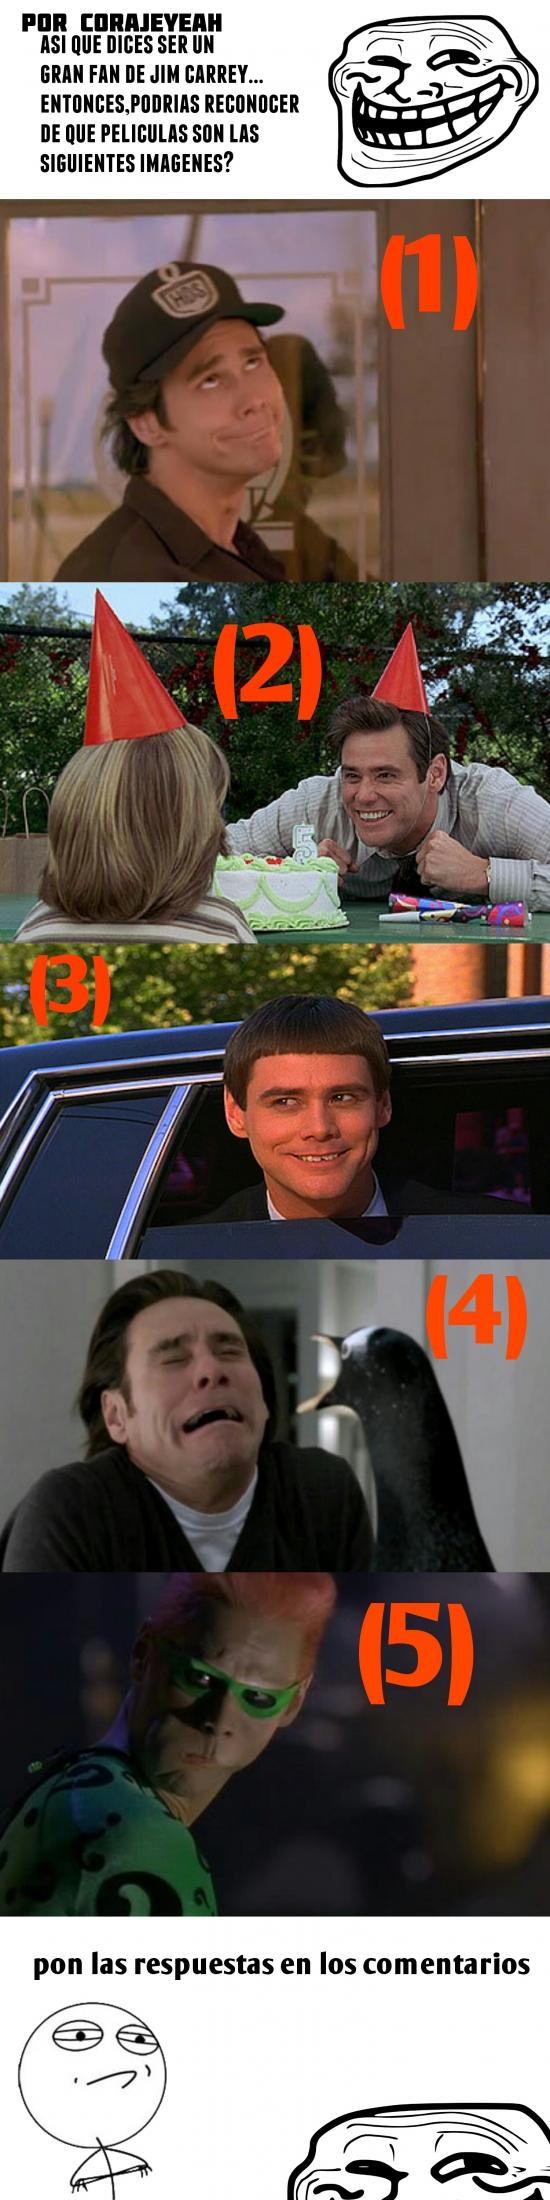 Trollface - ¿Eres un gran fan de Jim Carrey? ¡Demuéstralo!